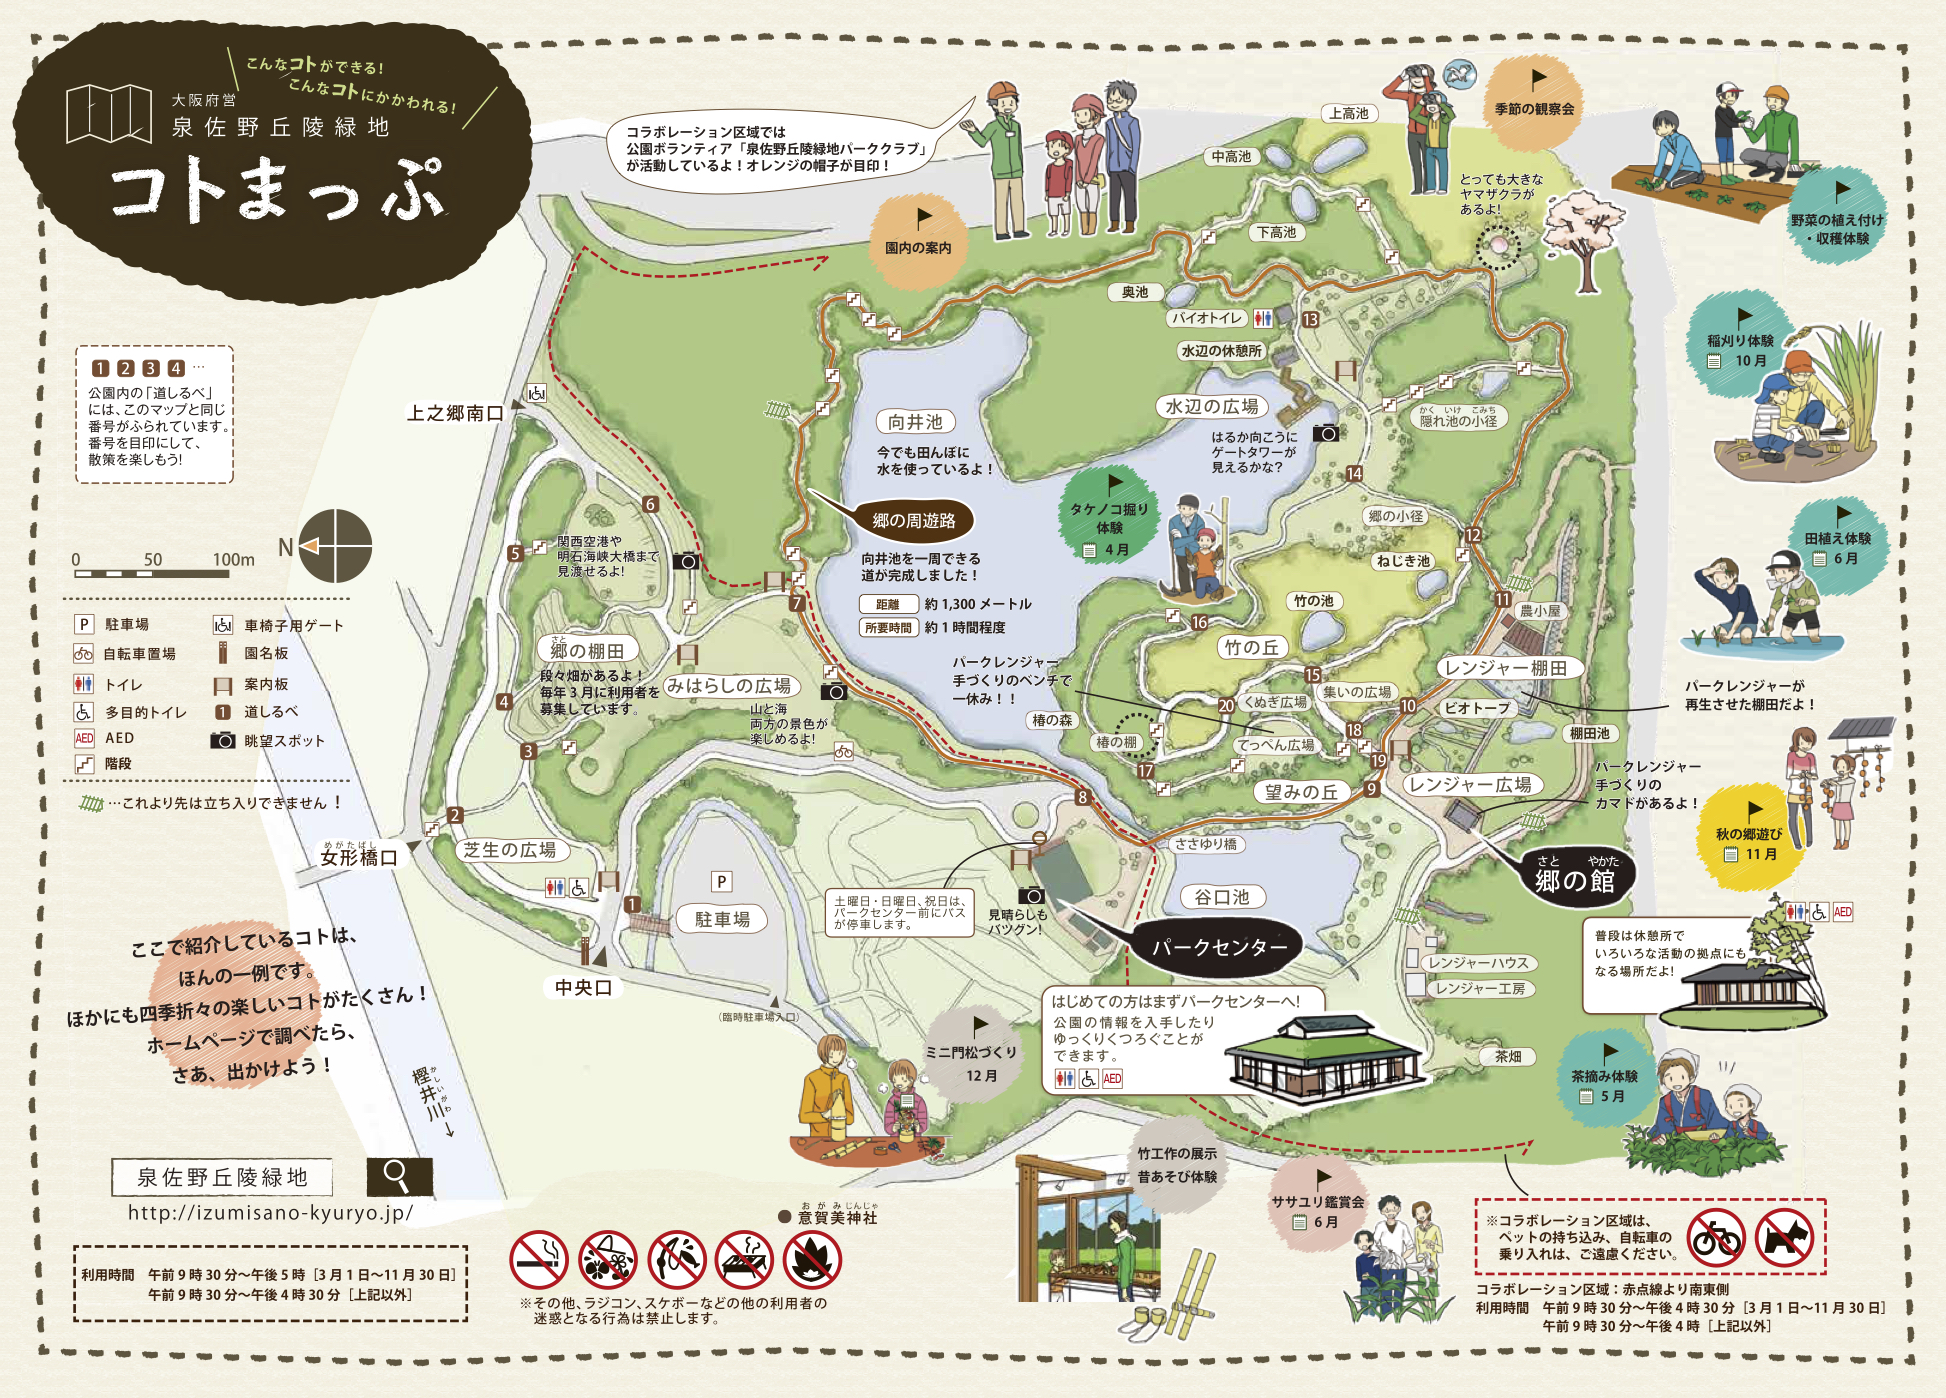 'Thing' map